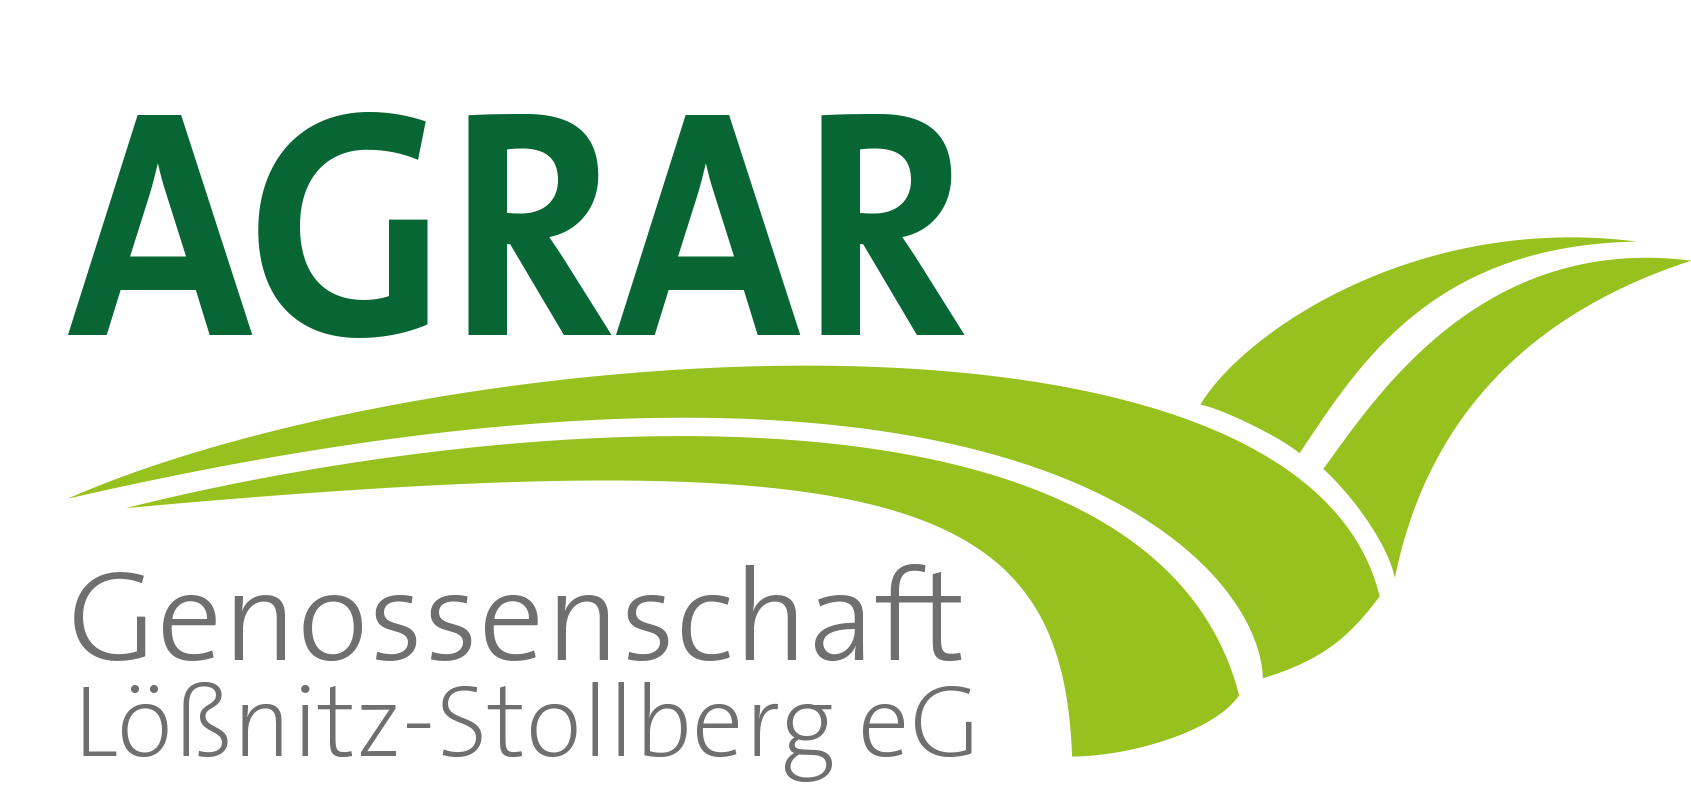 Agrargenossenschaft Lößnitz-Stollberg eG